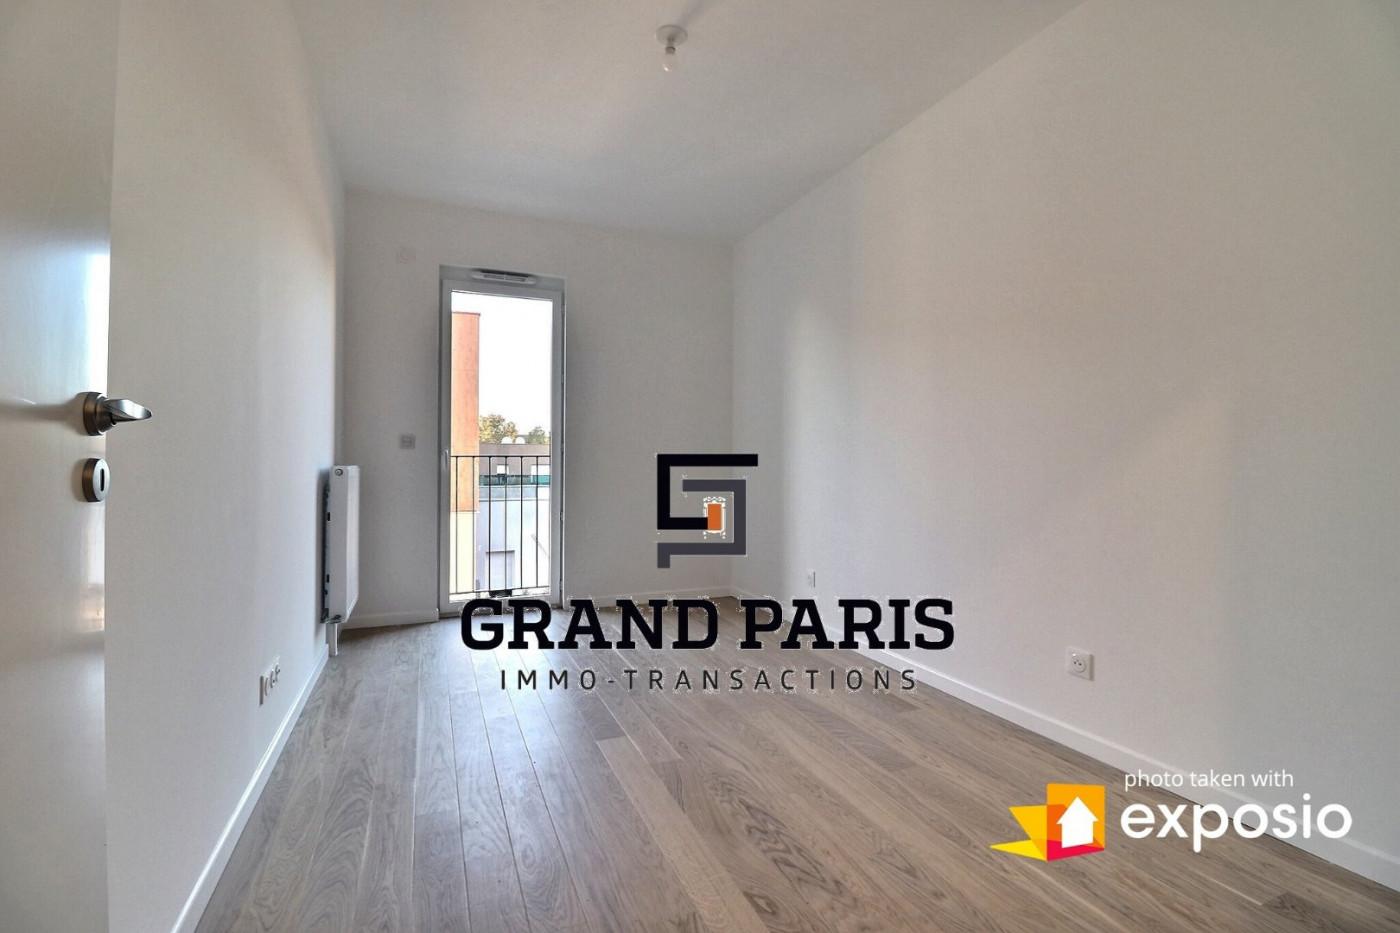 A vendre  Pantin | Réf 93005564 - Grand paris immo transaction